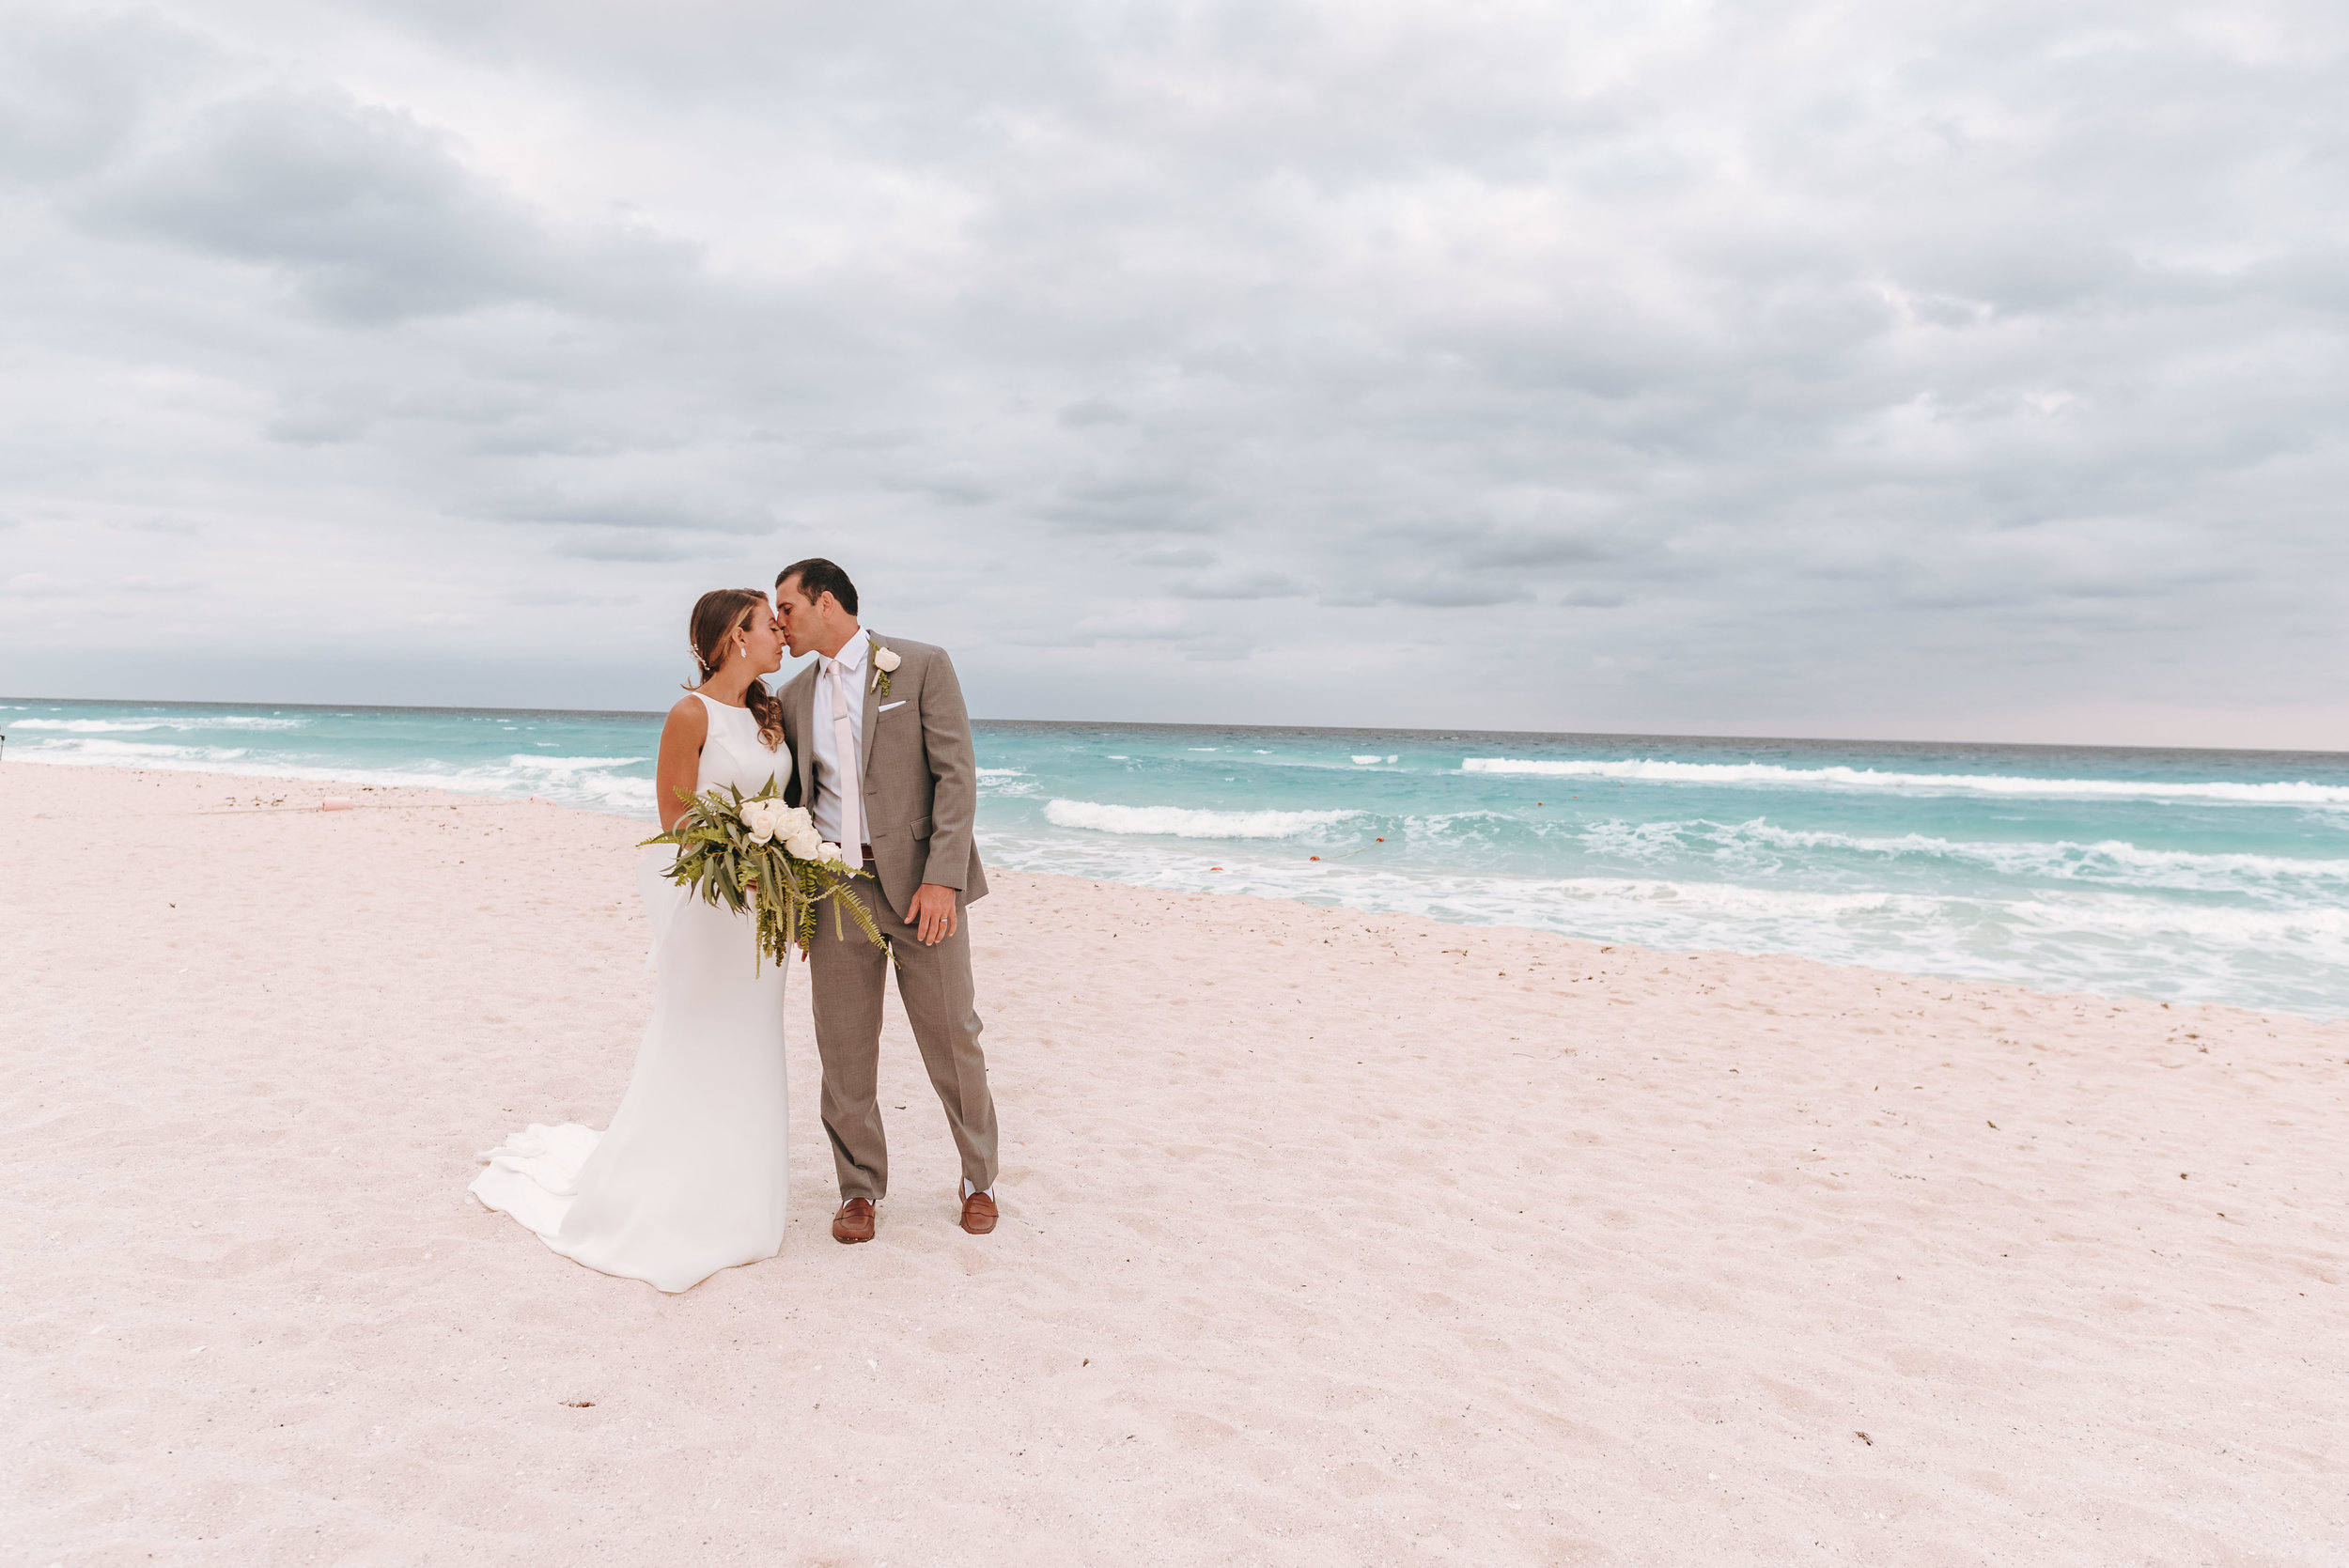 mexico_destination_wedding_ceremony-11.jpg